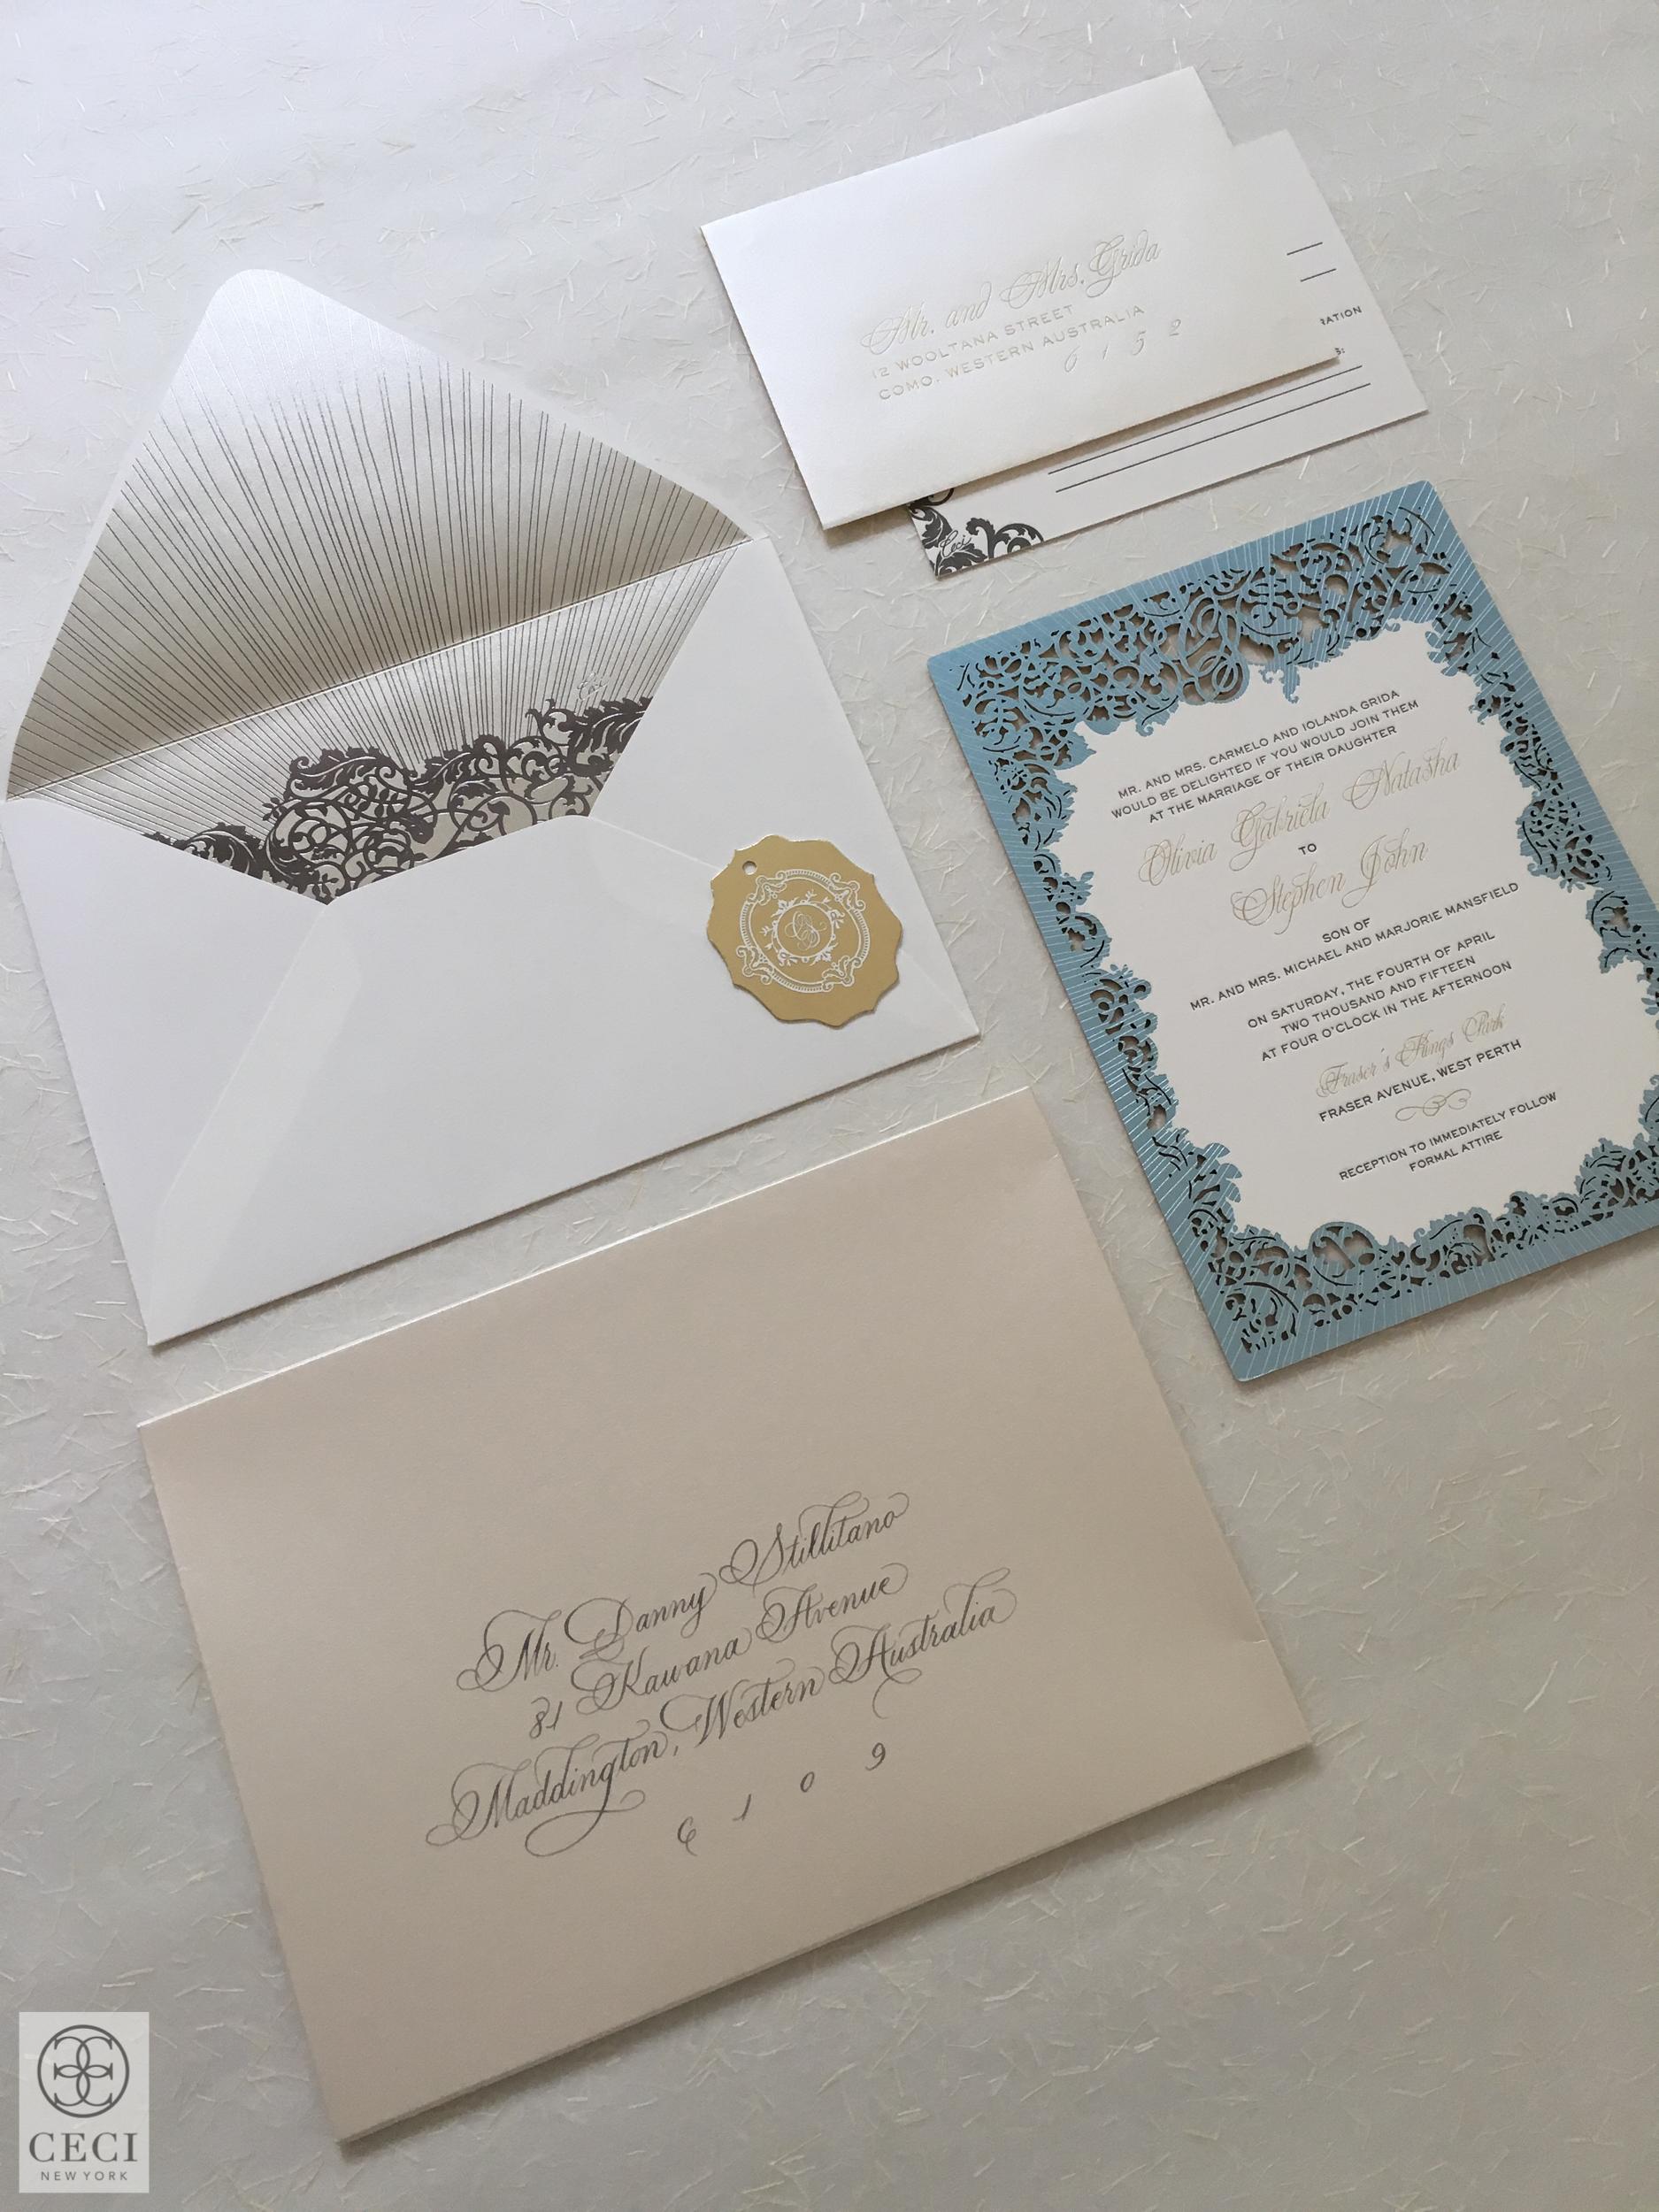 v2Ceci_New_York_Custom_Luxury_Wedding_BeautyShot_LaserCut_Stationery_Personalized_Couture_Foil_Stamping_Perth_Destination_Australia_Chic_-7.jpg